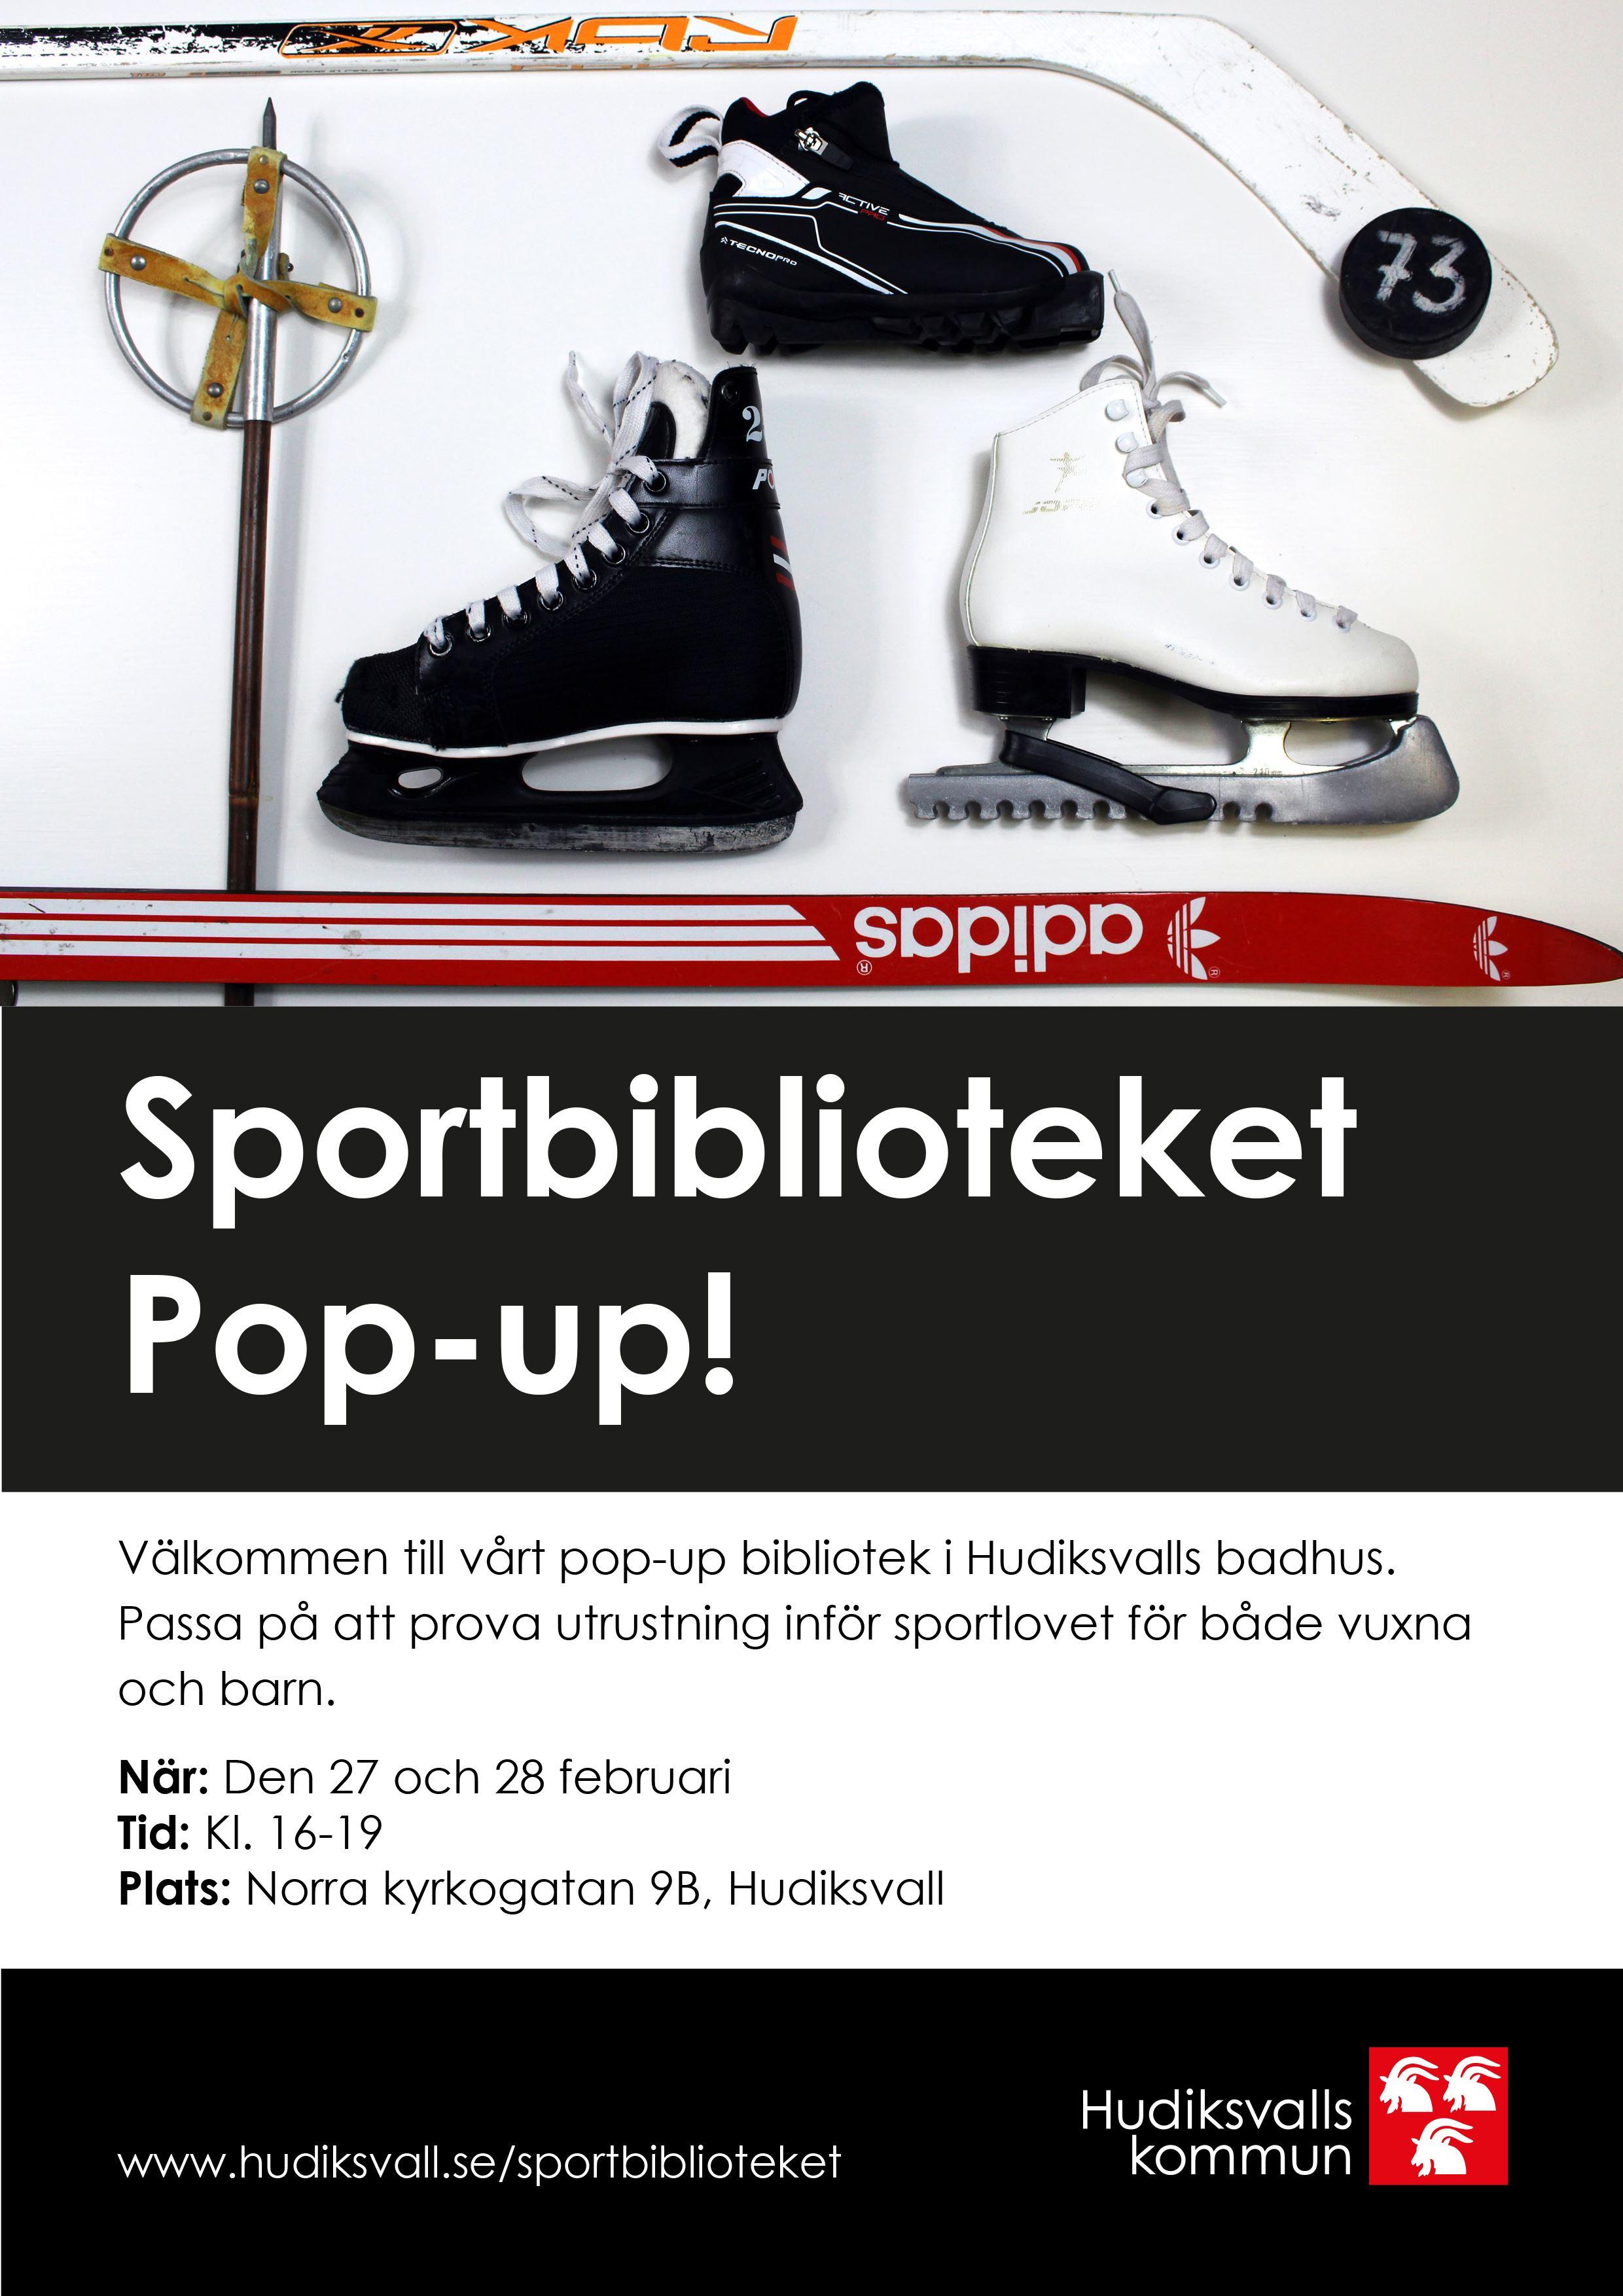 Sportbiblioteket Pop-up